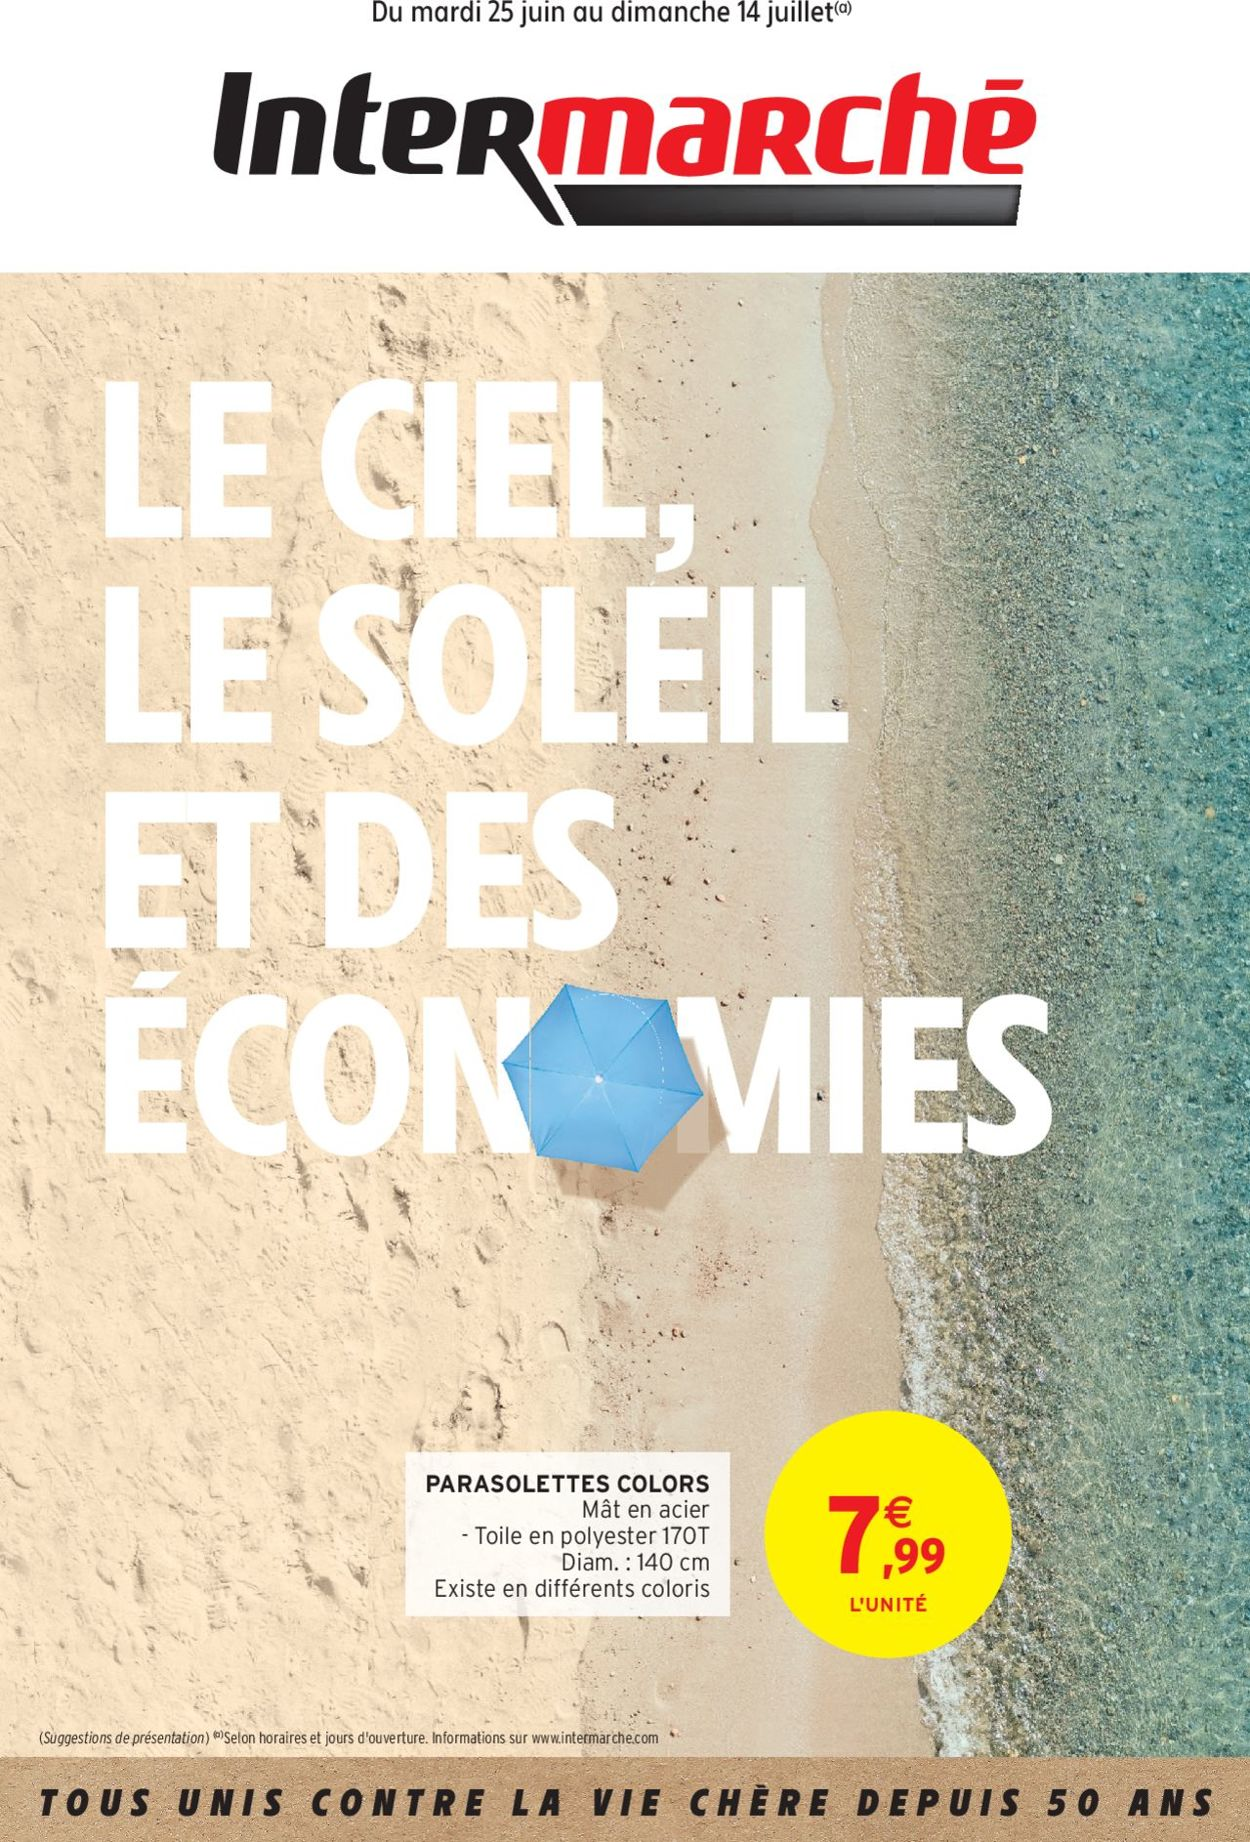 Intermarché Catalogue - 25.06-14.07.2019